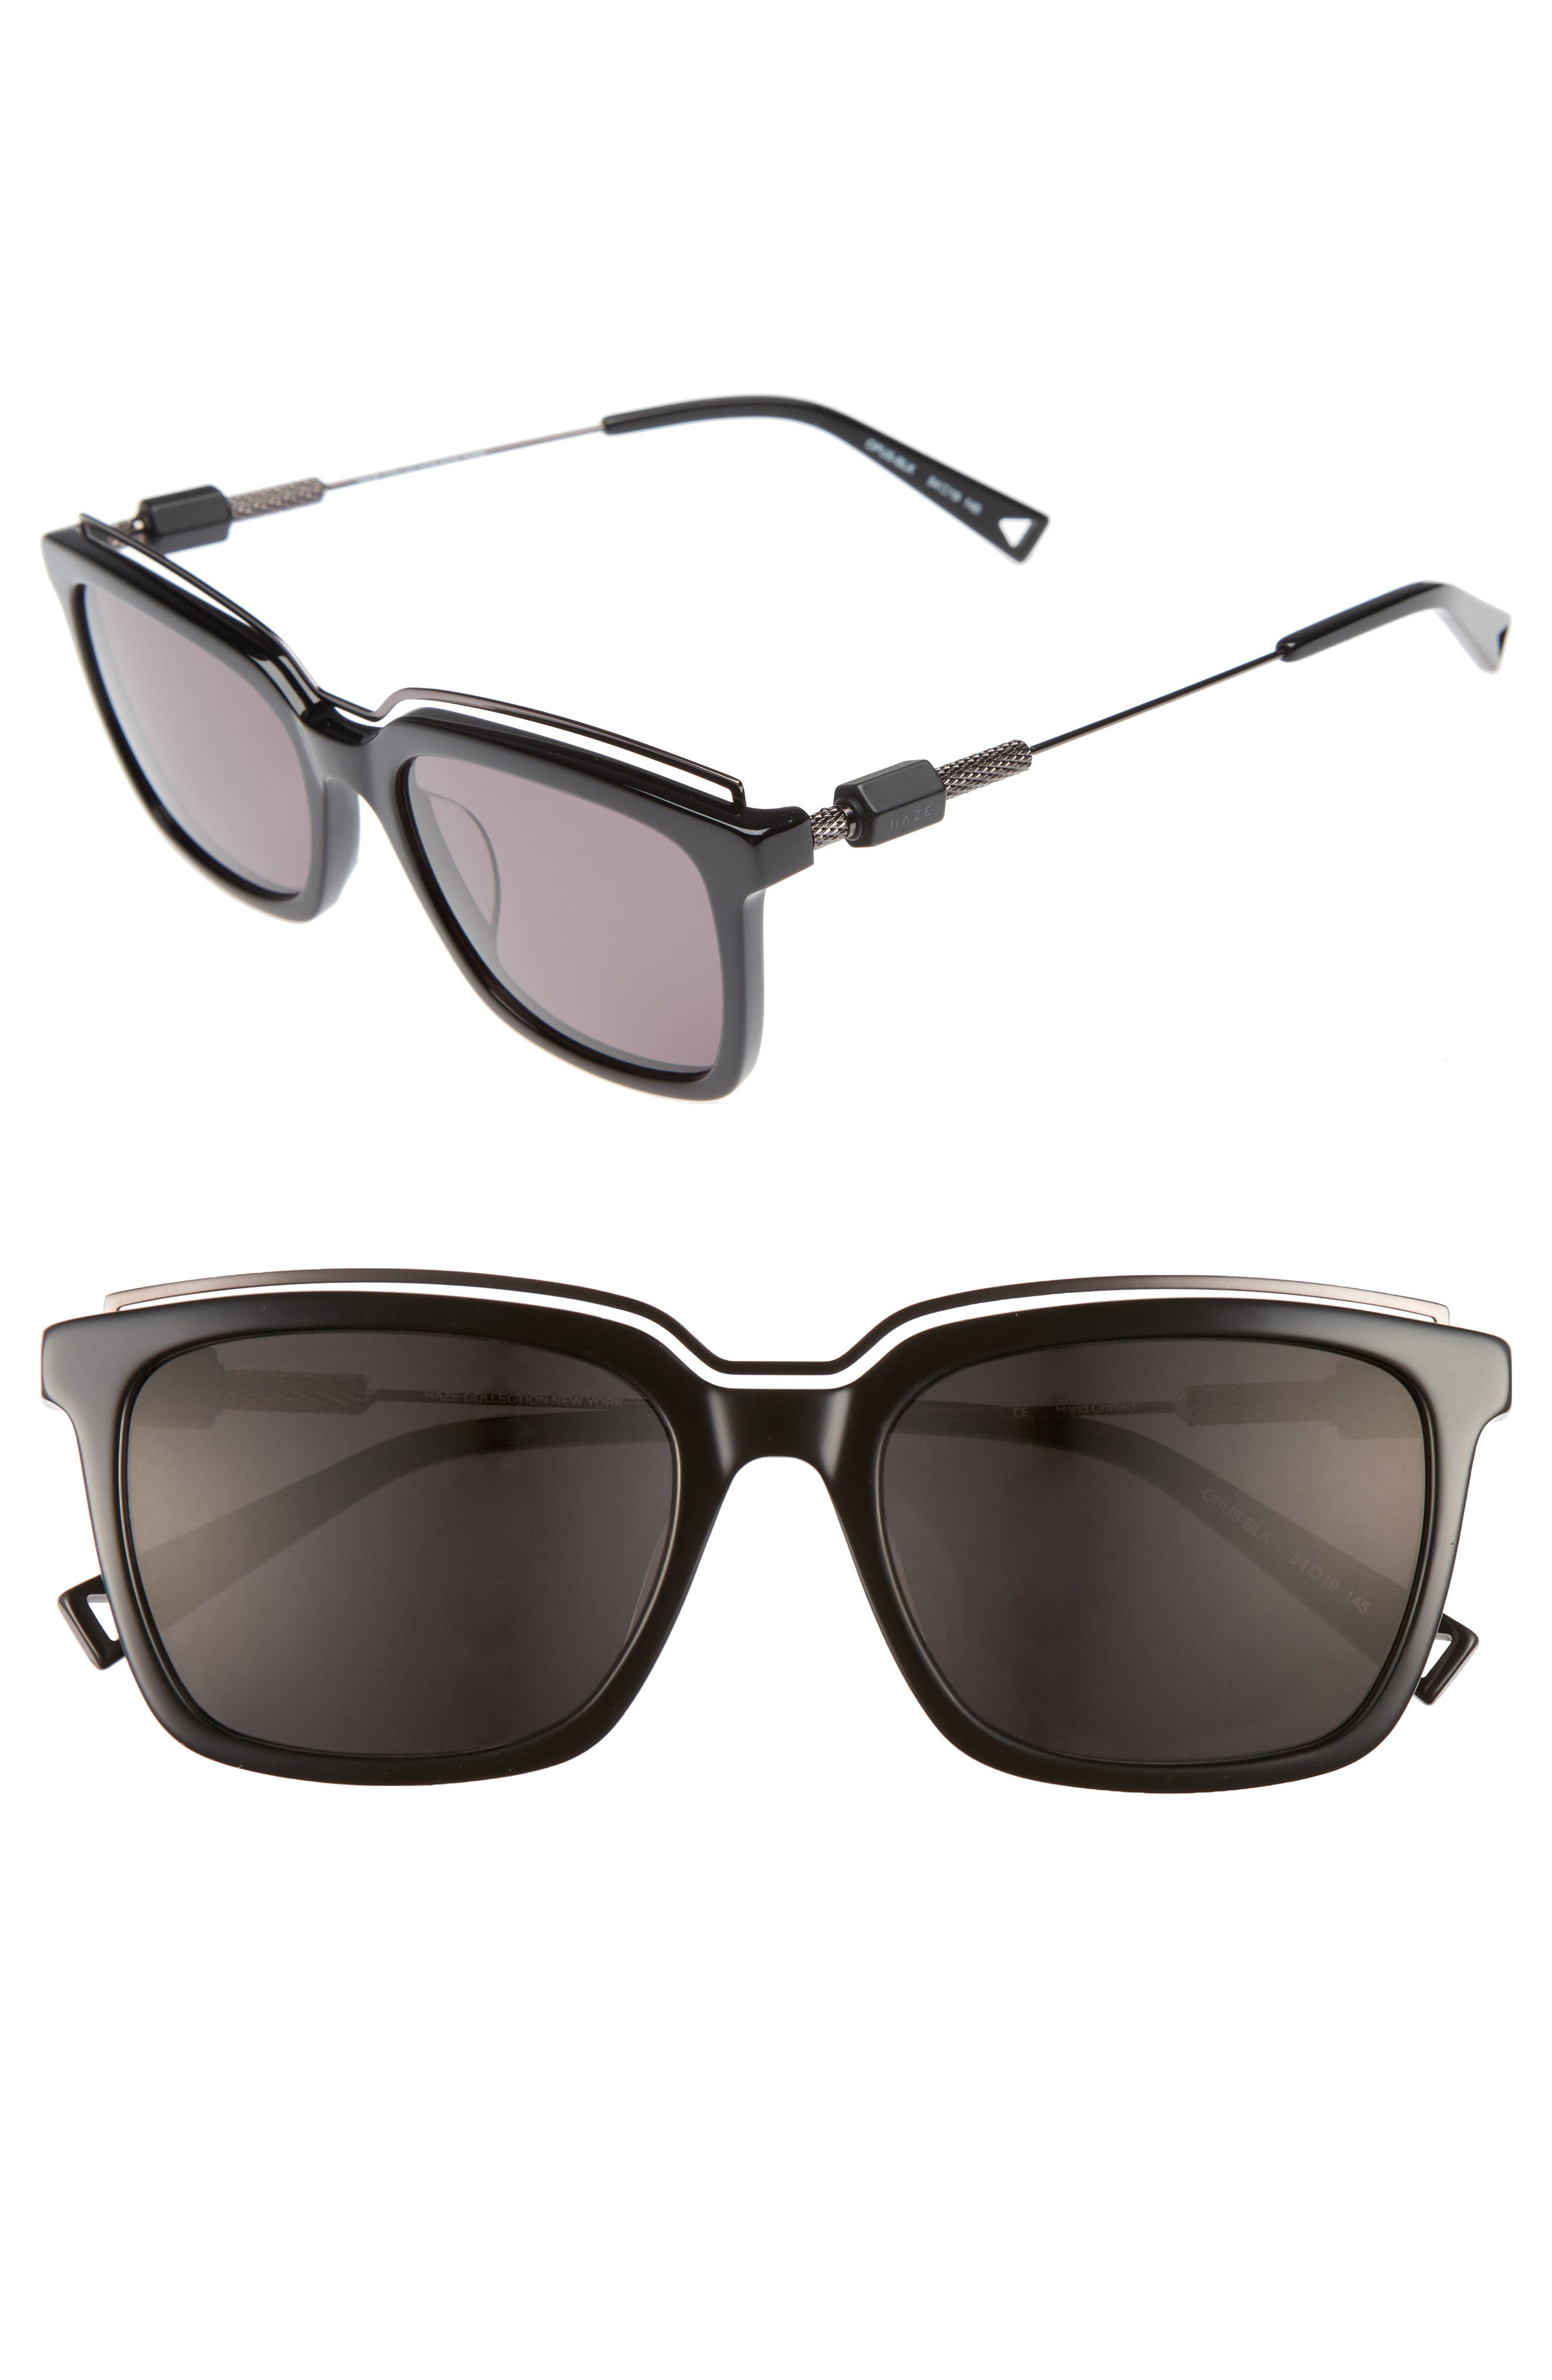 Opus 54mm Sunglasses,                             Main thumbnail 1, color,